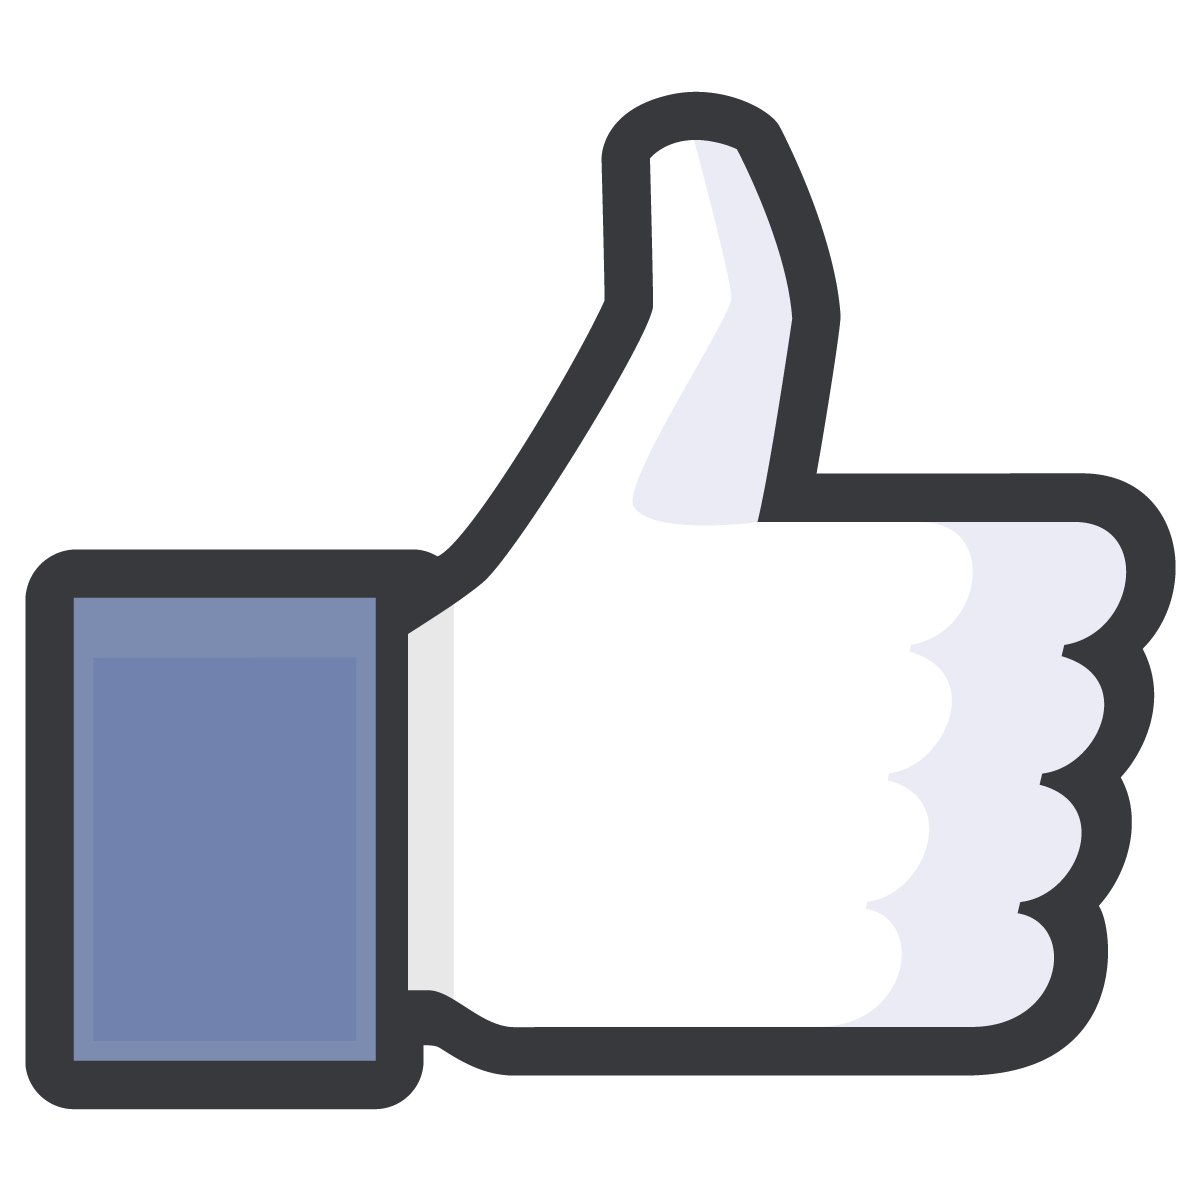 socialfacebook.png